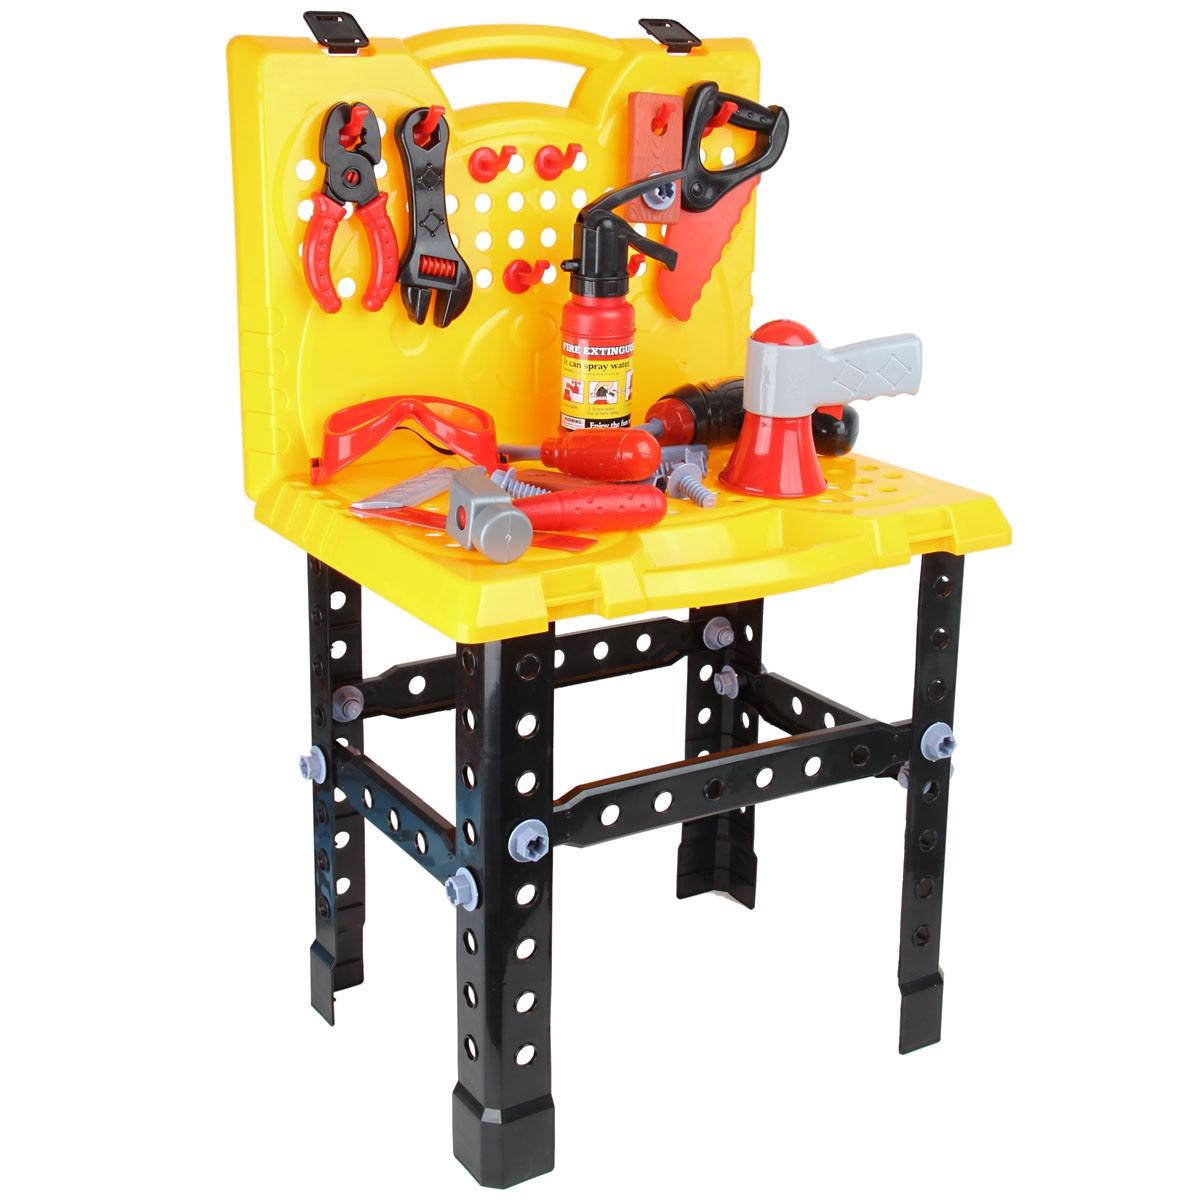 Набор инструментов в чемодане Veld Co